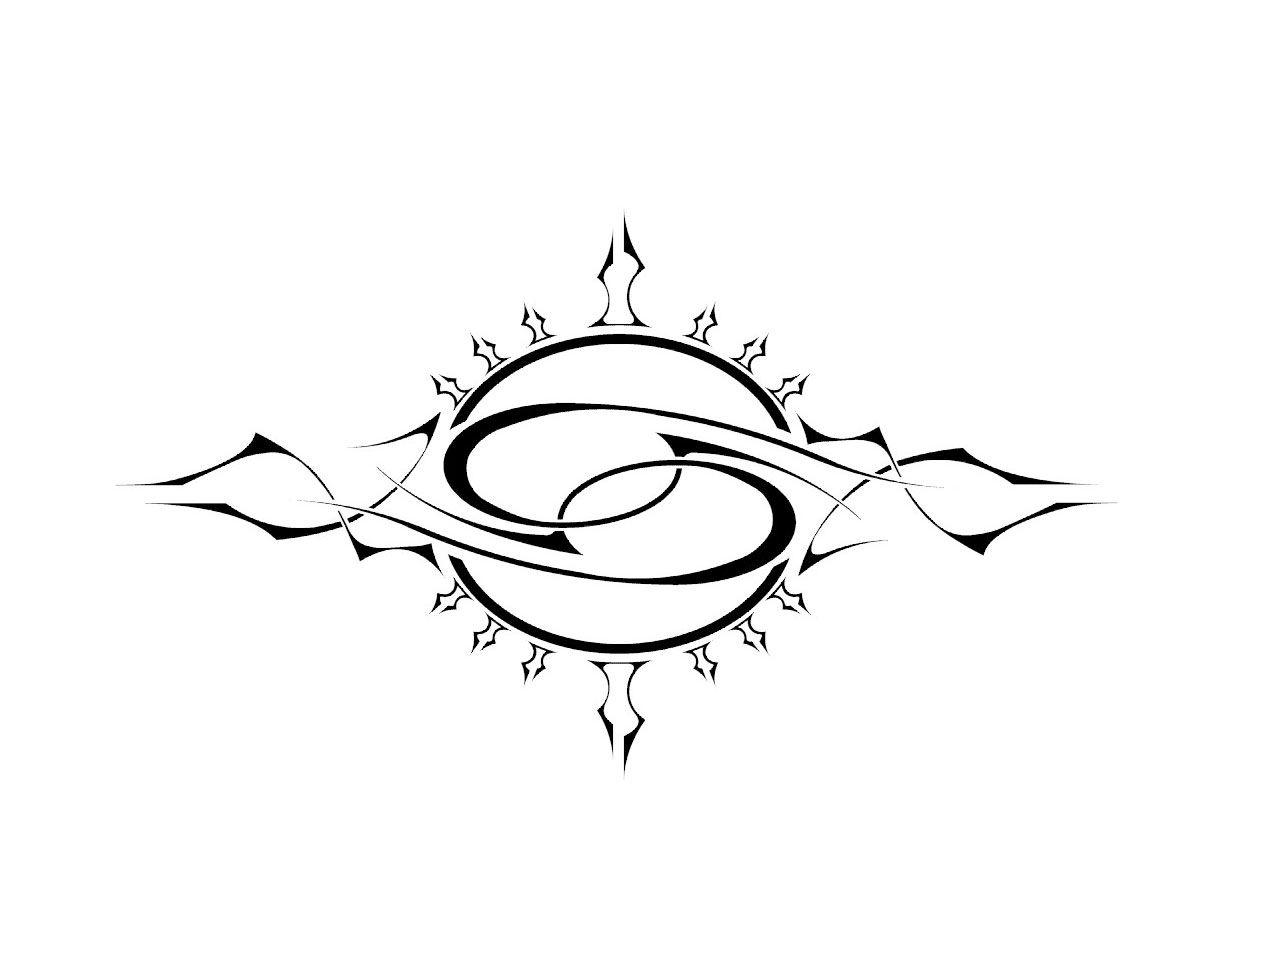 Pin By Stephanie Harrison On Tetovani In 2020 Cancer Sign Tattoos Cancer Tattoos Cancer Zodiac Tattoo